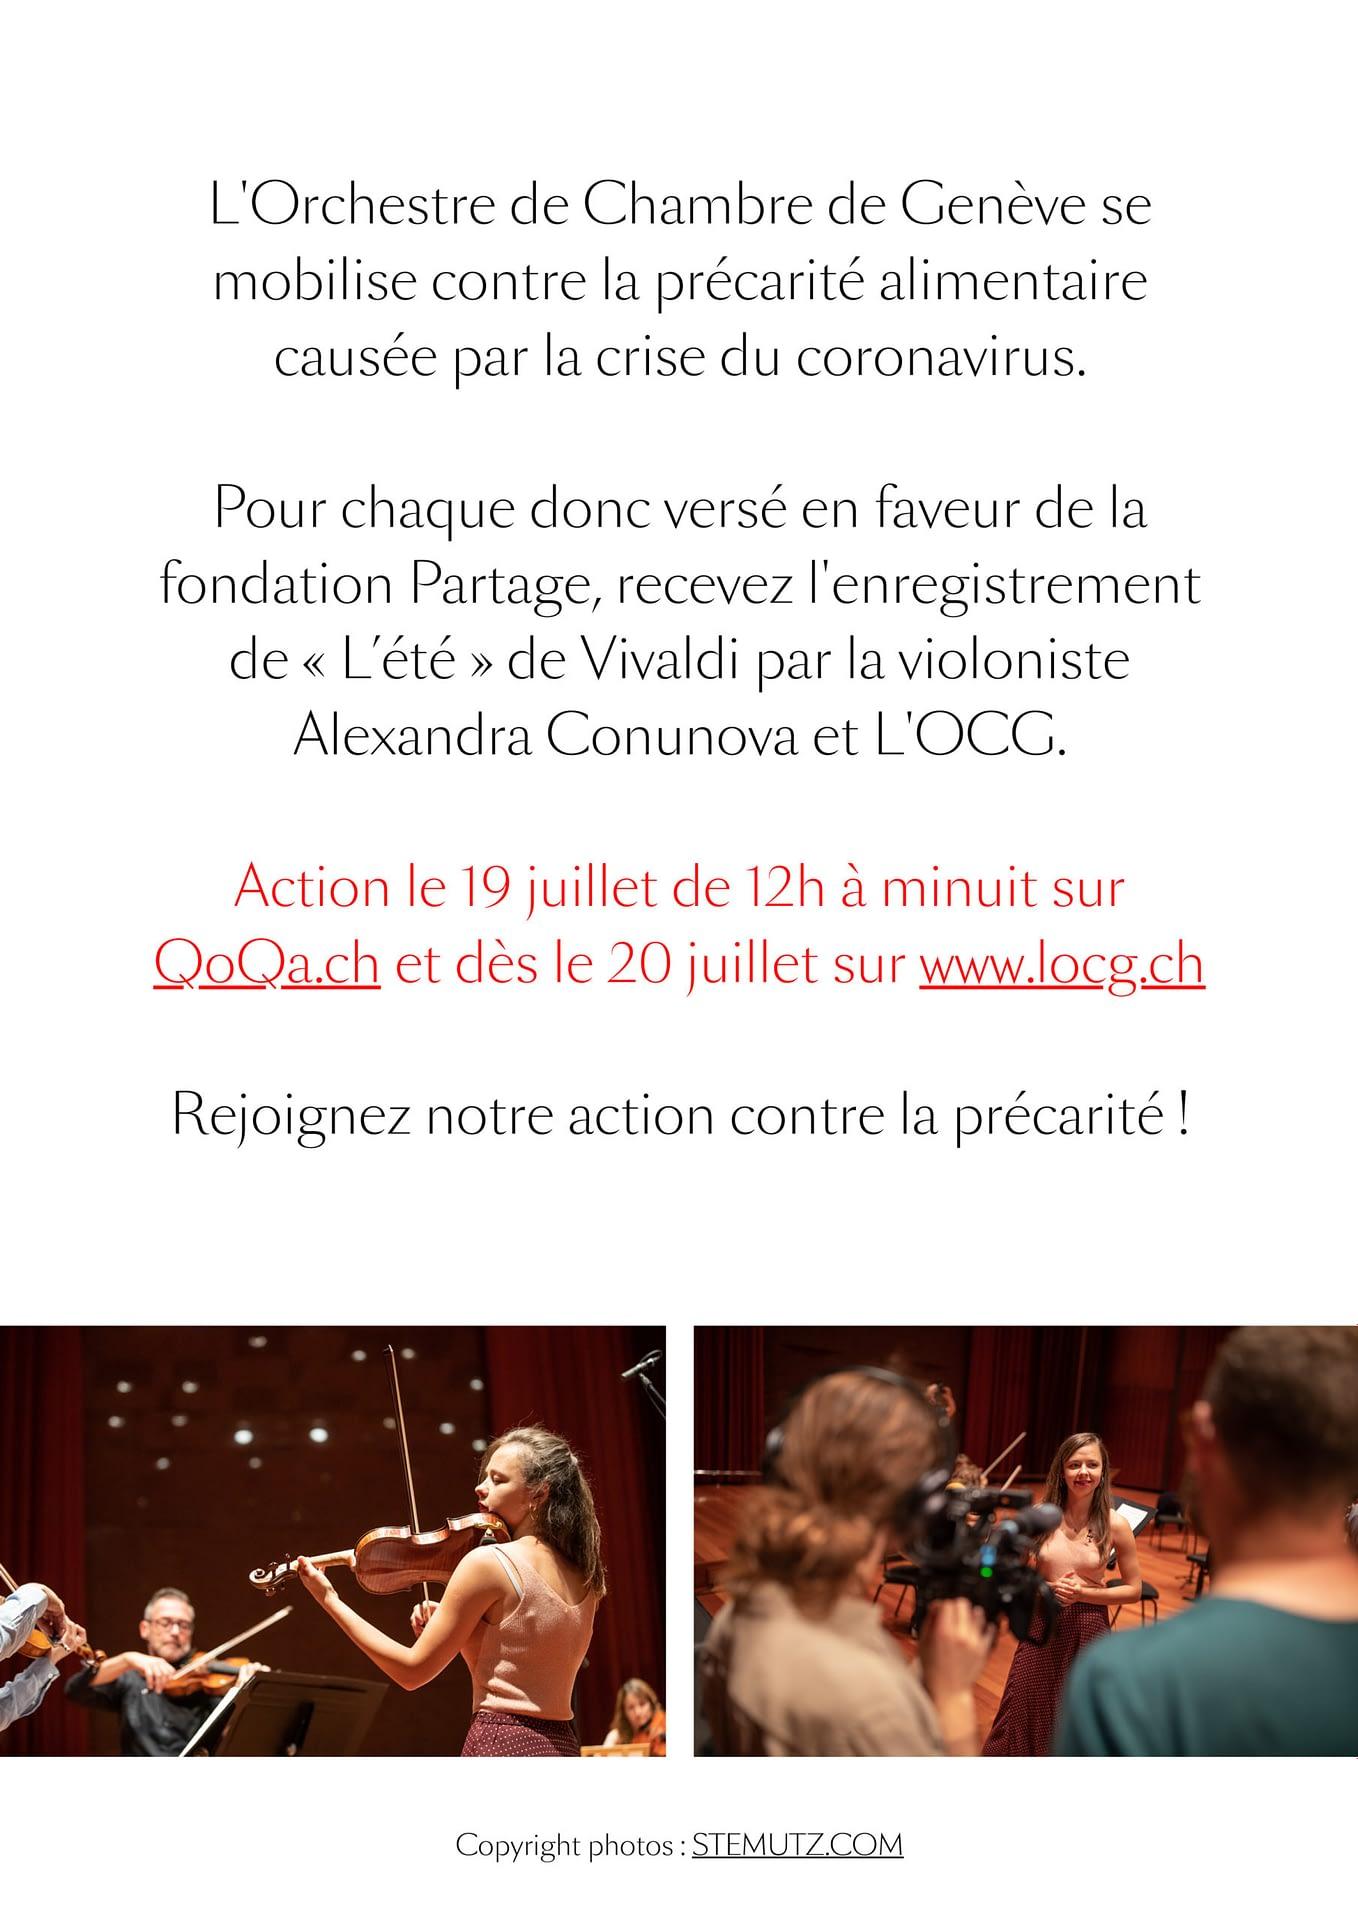 Flyer et dociments L'OCG avec Alexandra Conunova by STEMUTZ, Studio Ansermet, 01.07.2020